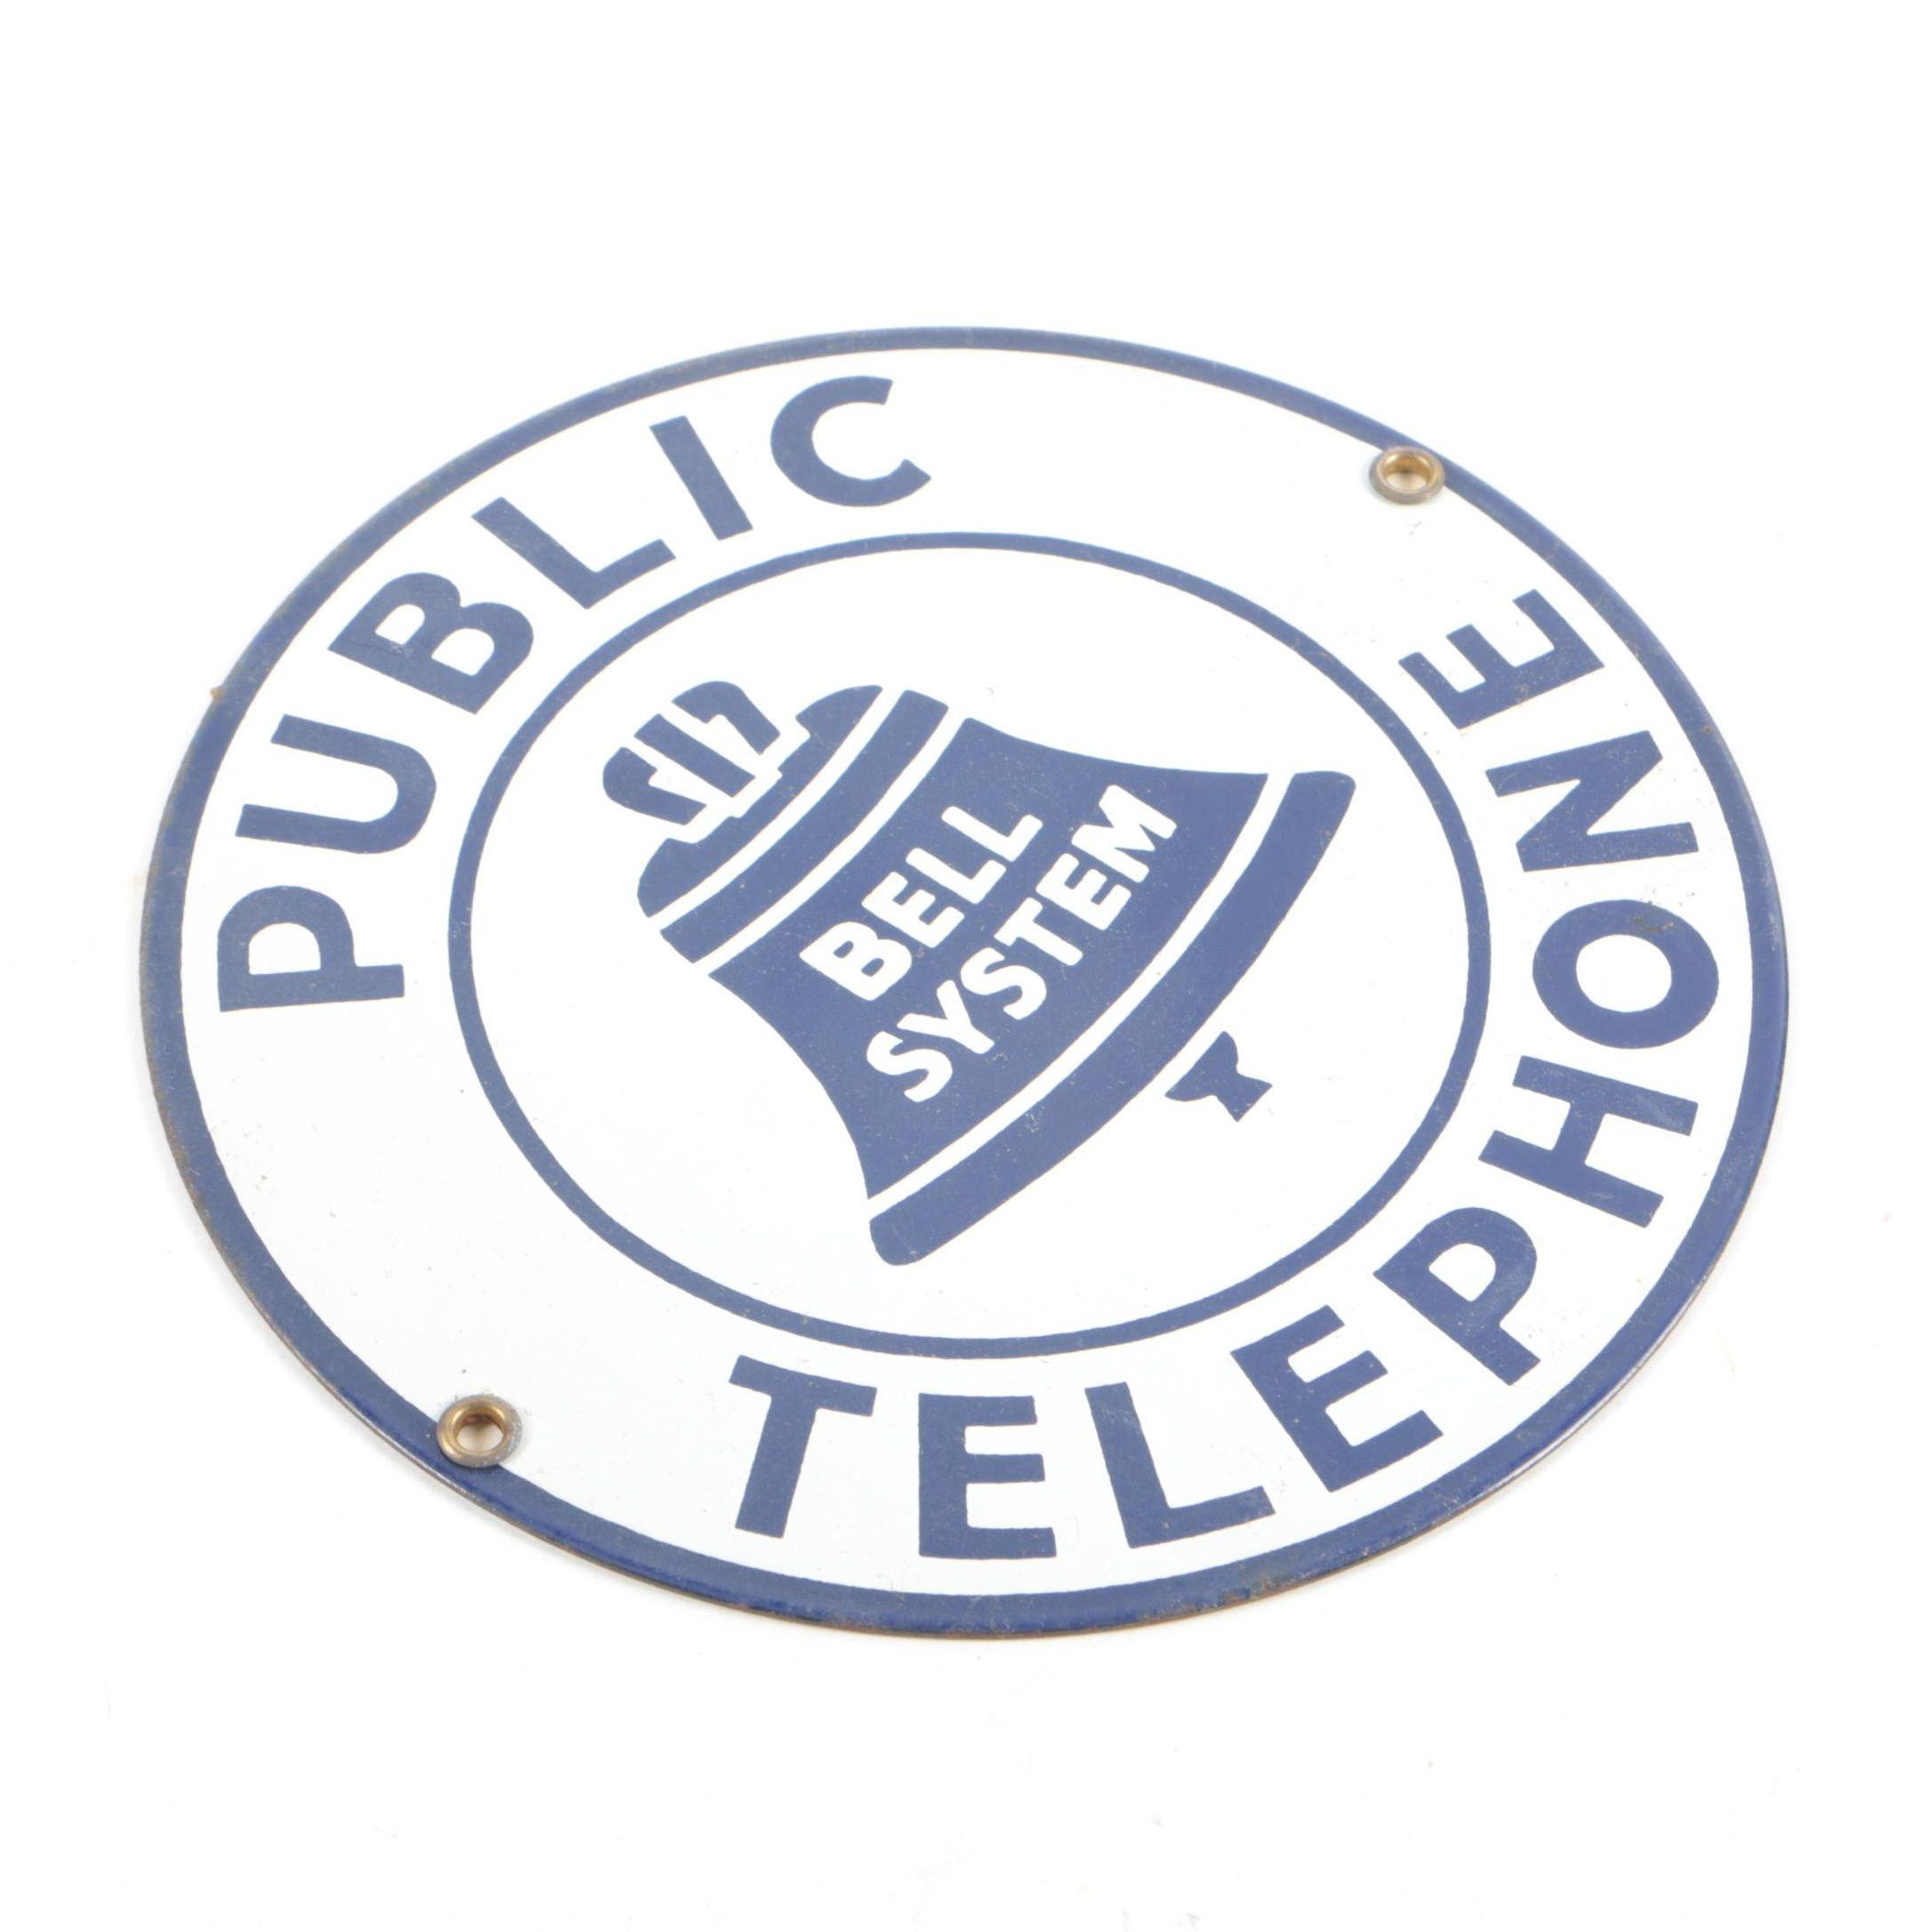 Public Telephone Sign